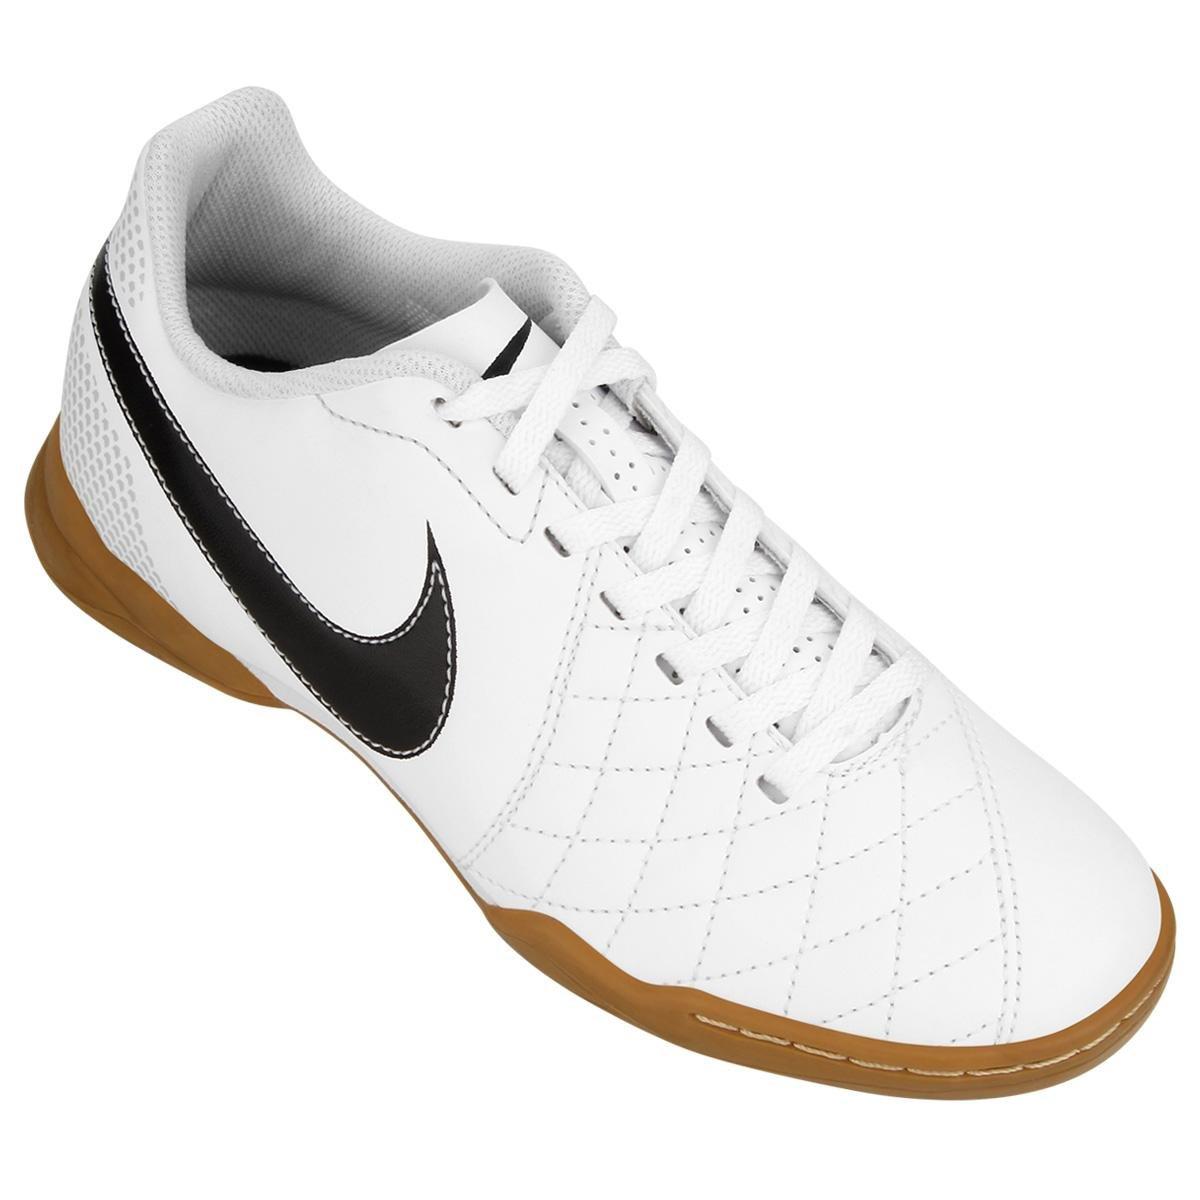 Chuteira Nike Flare IC Infantil - Compre Agora  b51c0a26c9bc5